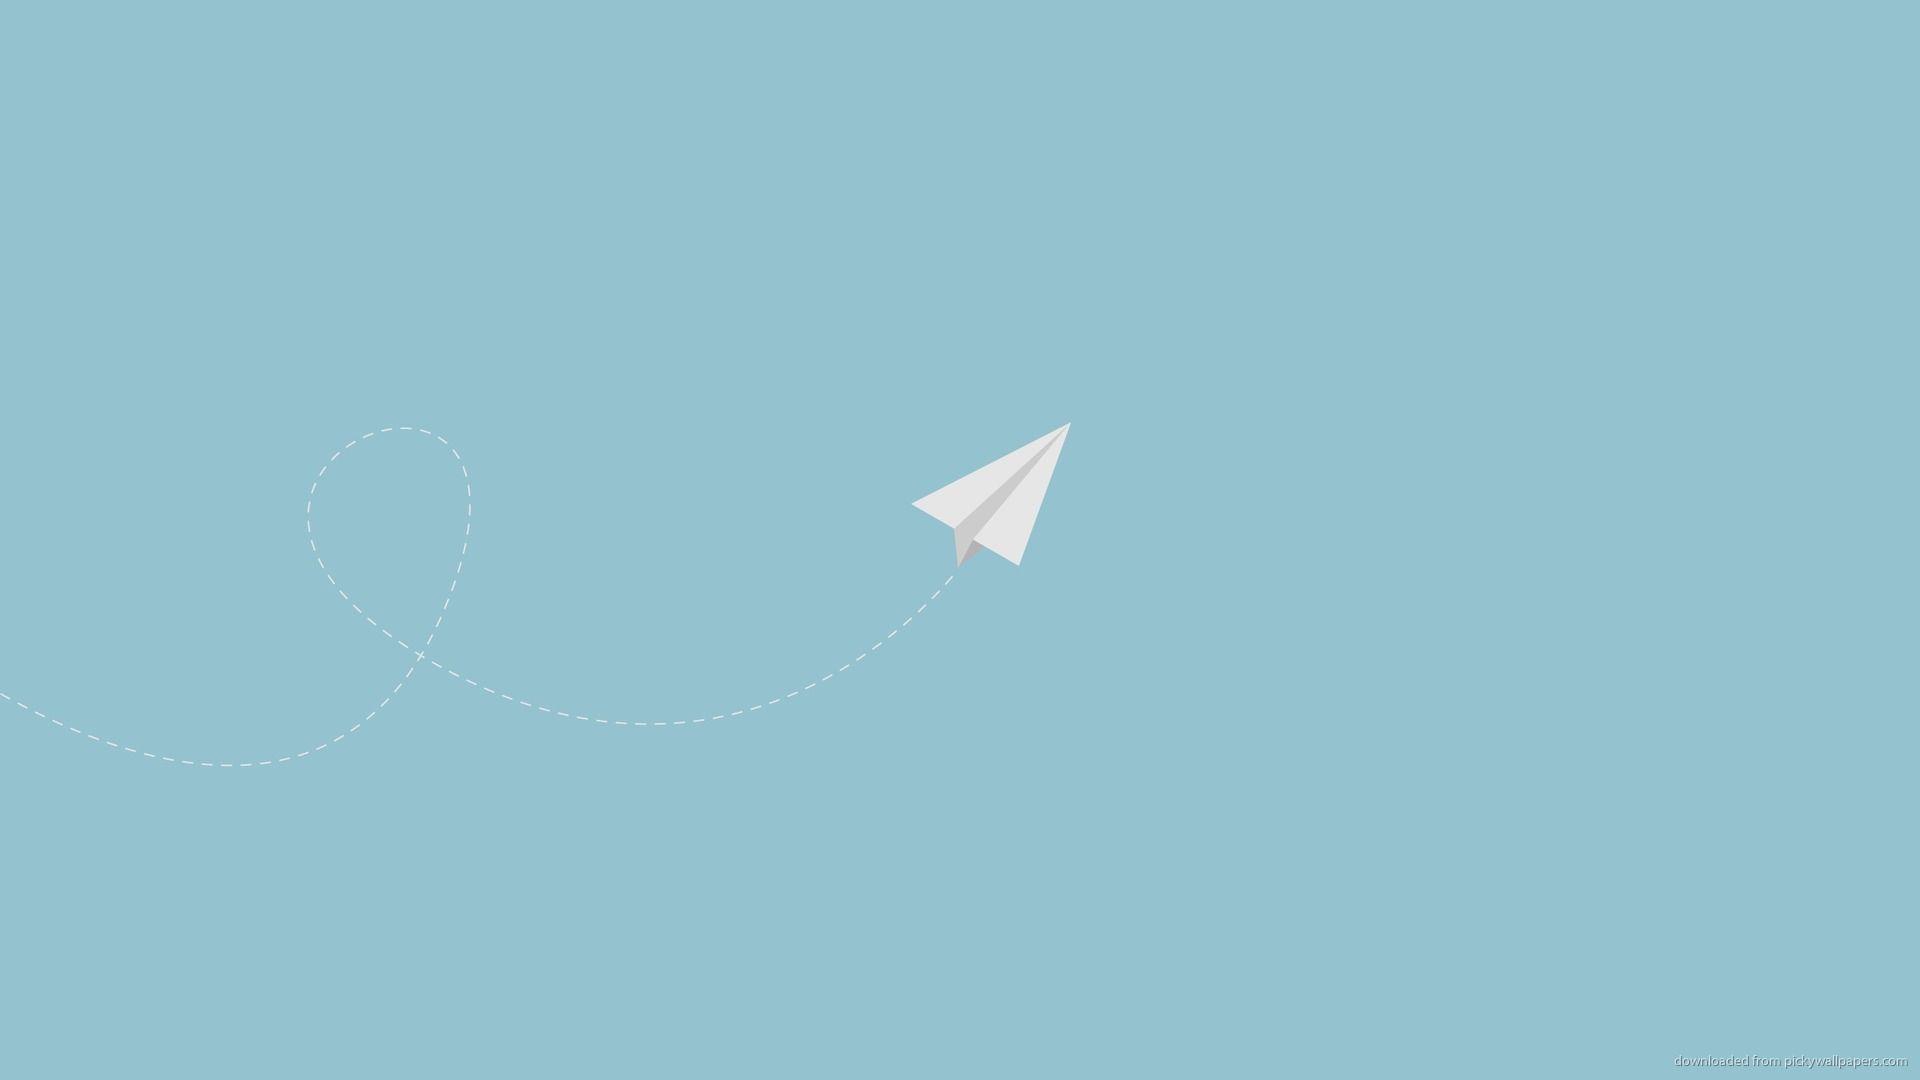 Download 1920x1080 Minimal Flying Paper Plane Wallpaper In